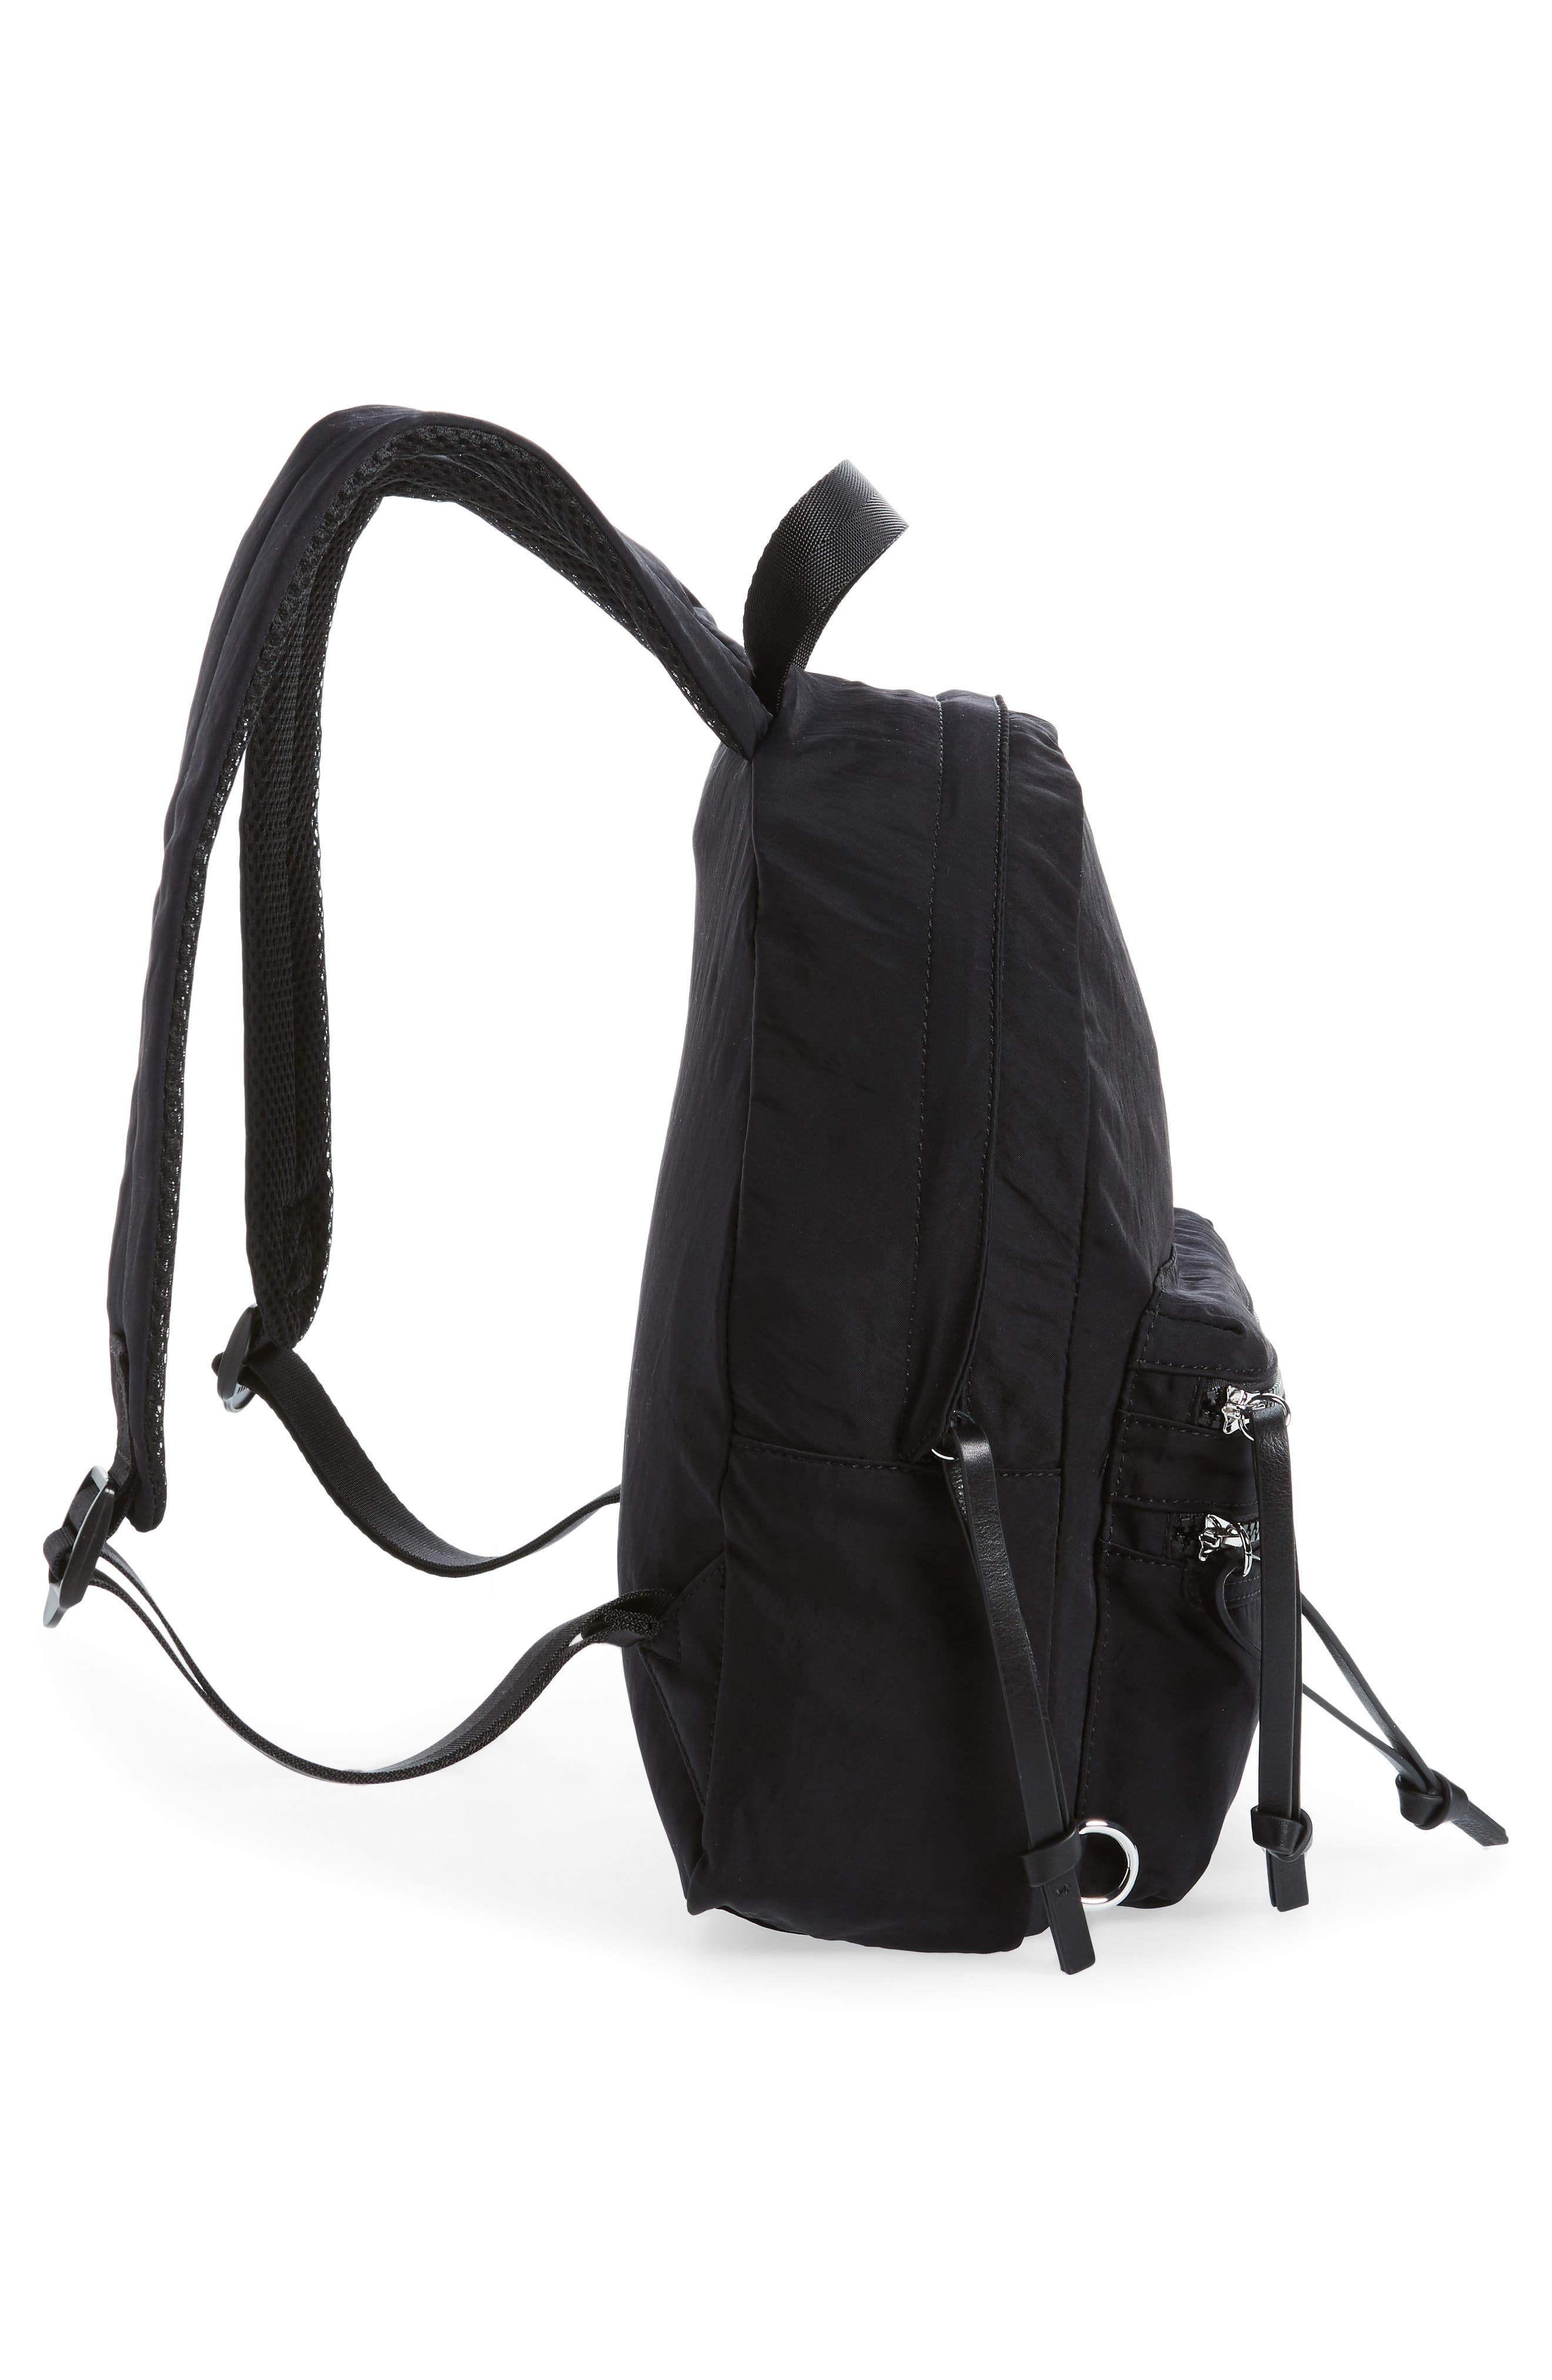 REBECCA MINKOFF, Nylon Backpack, Alternate thumbnail 6, color, BLACK